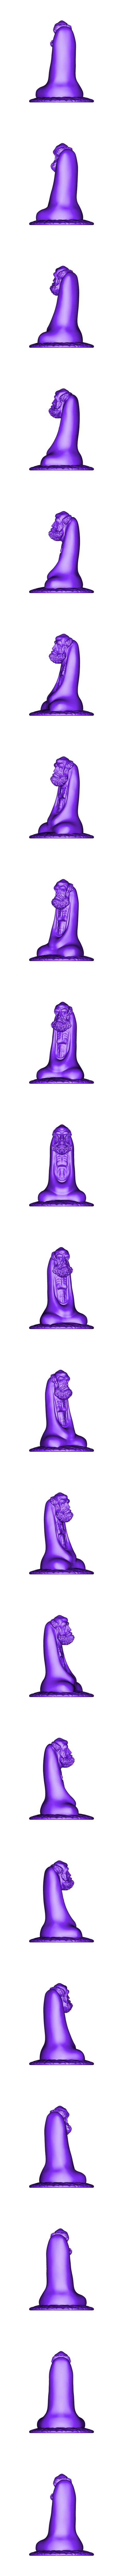 BodhidharmaB.stl Download free STL file Bodhidharma • 3D printing design, stlfilesfree